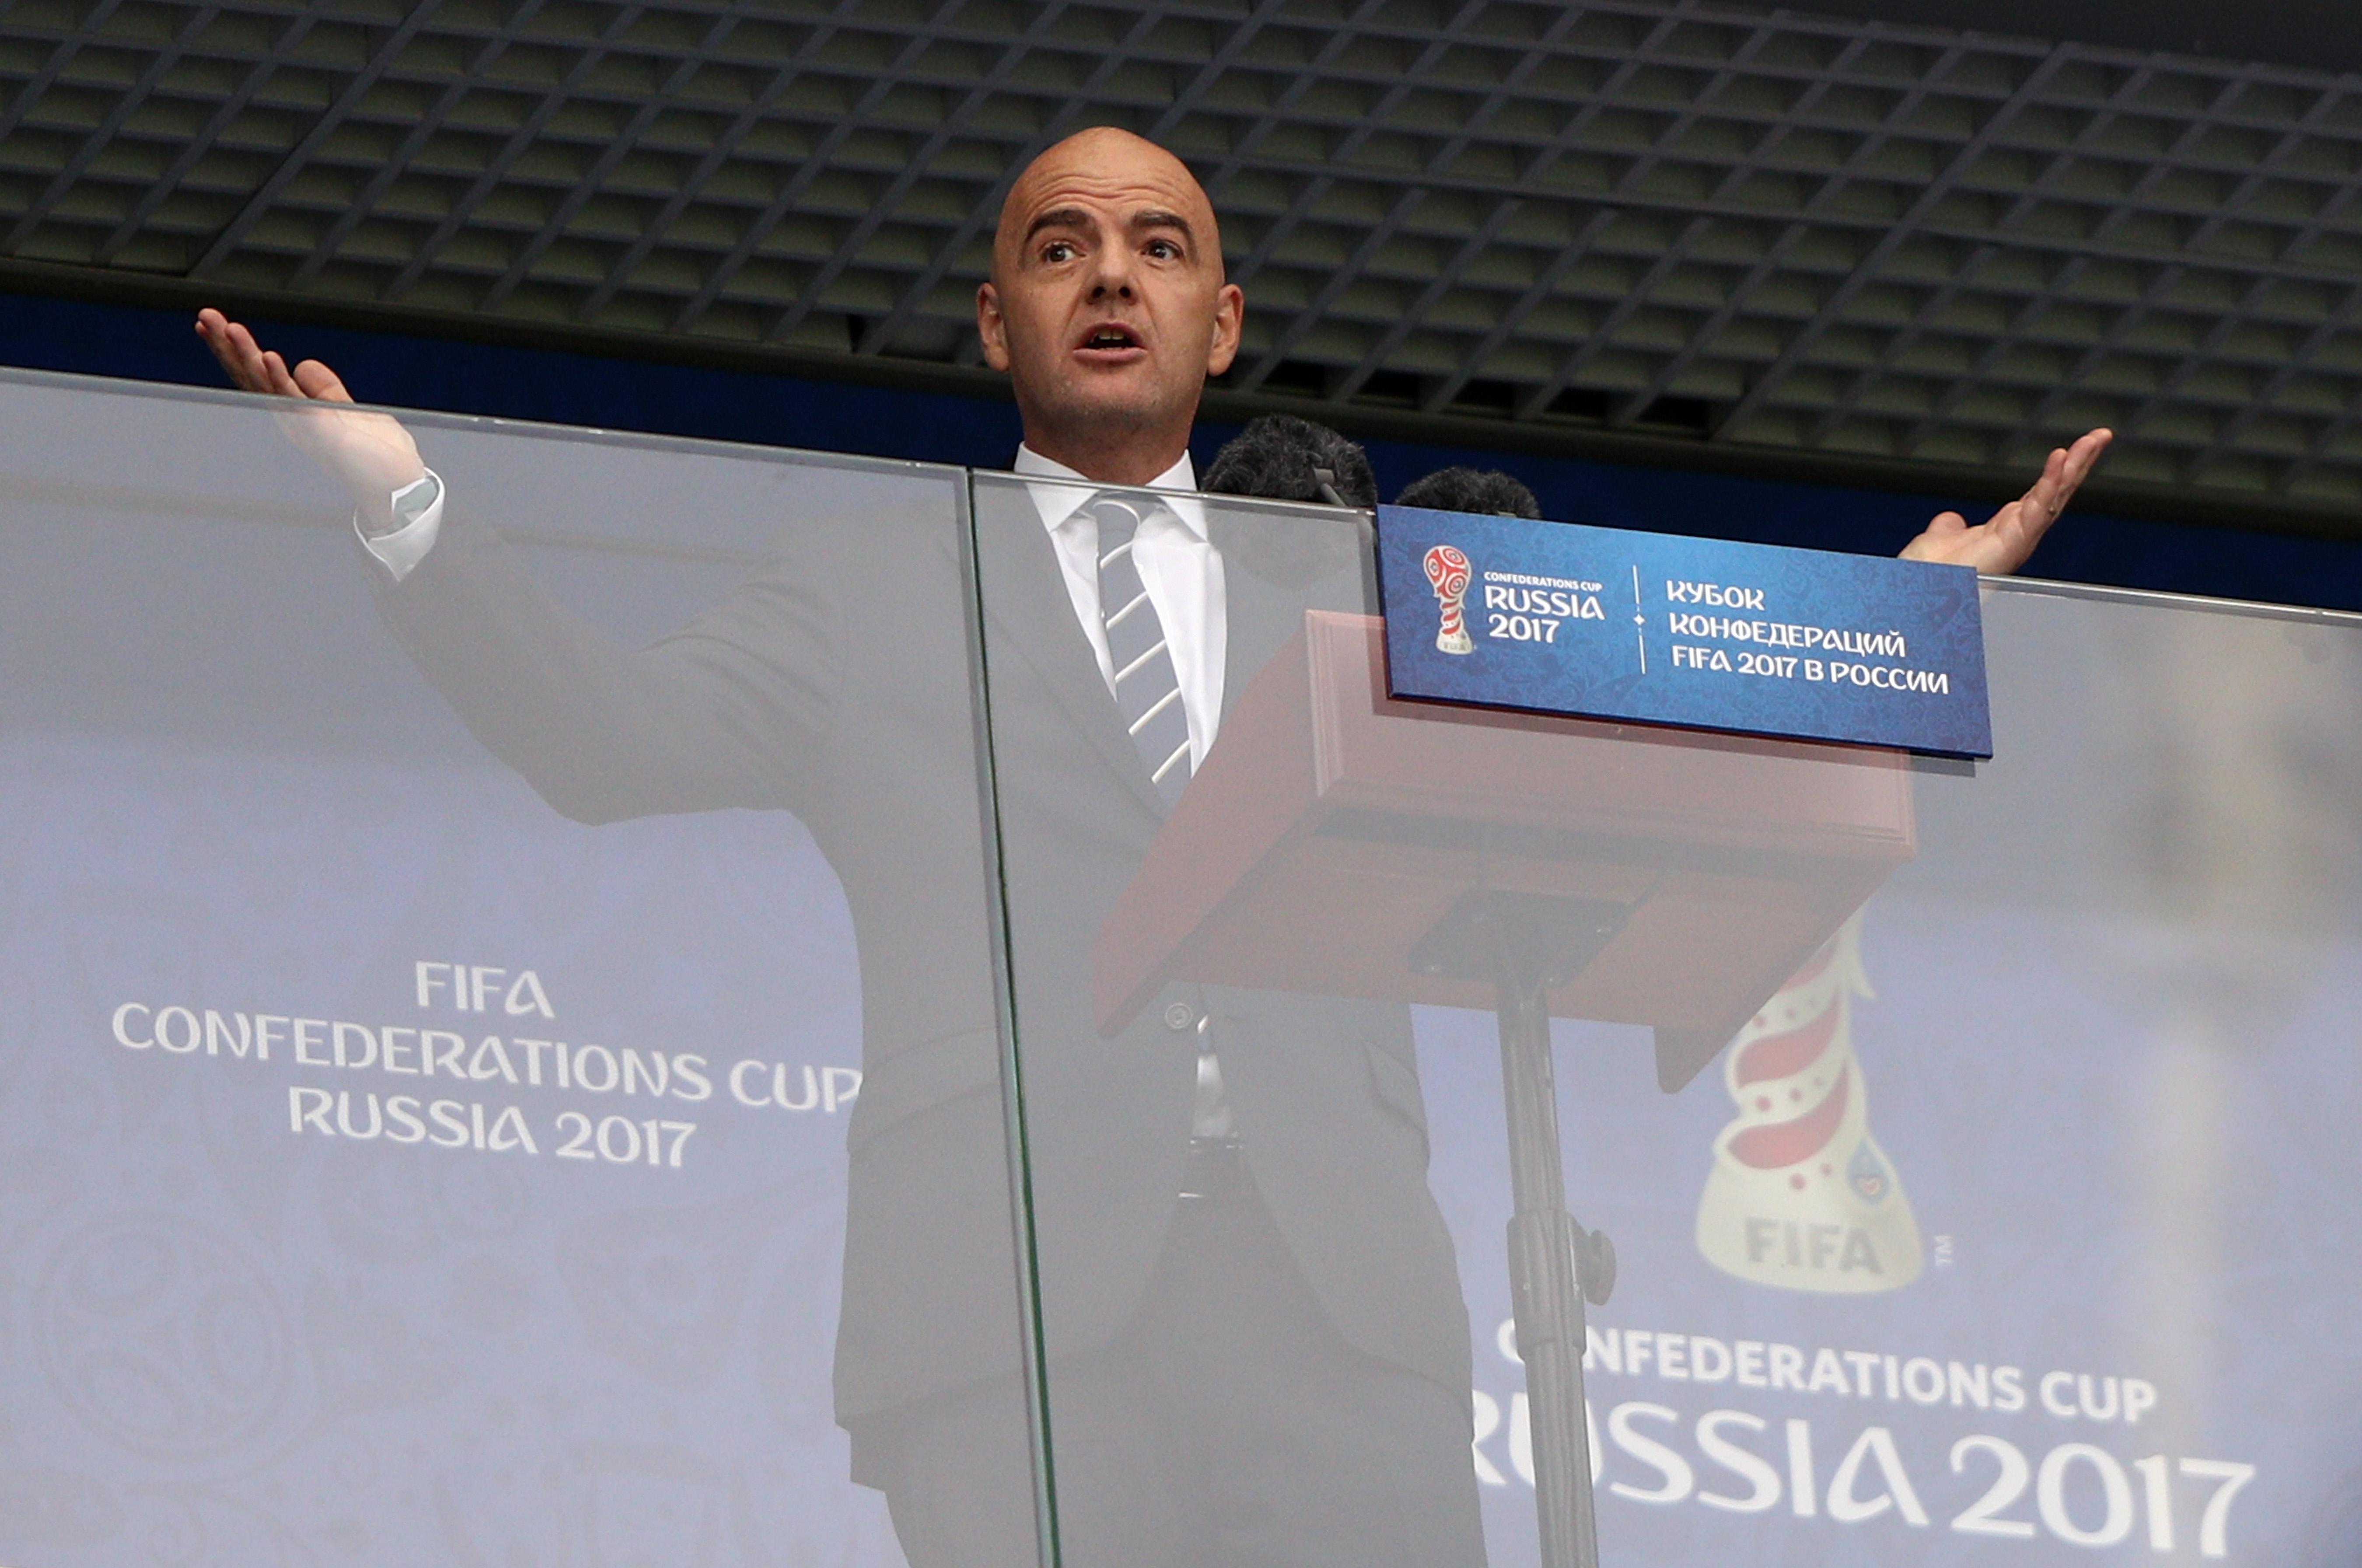 Russia v New Zealand: Group A - FIFA Confederations Cup Russia 2017